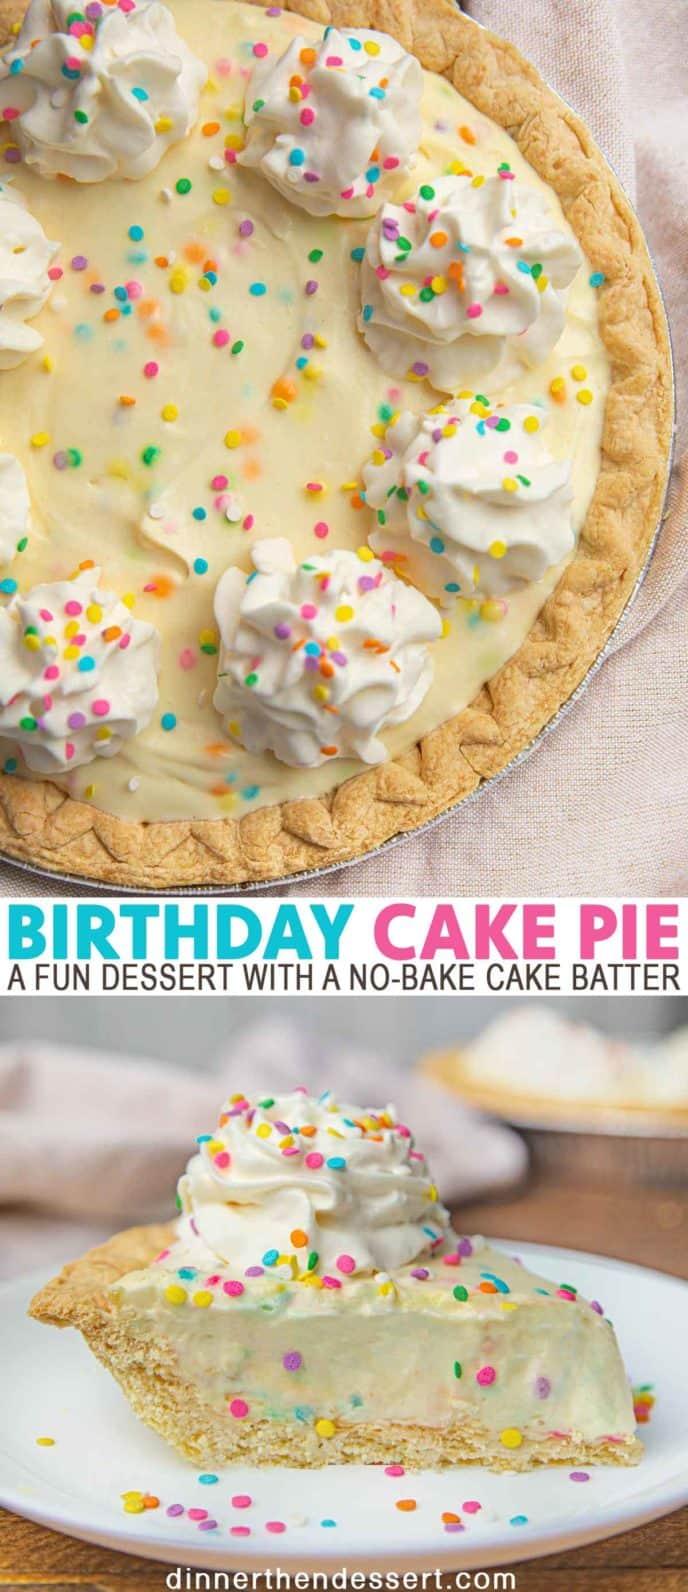 Super Birthday Cake Pie With Rainbow Sprinkles Dinner Then Dessert Funny Birthday Cards Online Inifofree Goldxyz